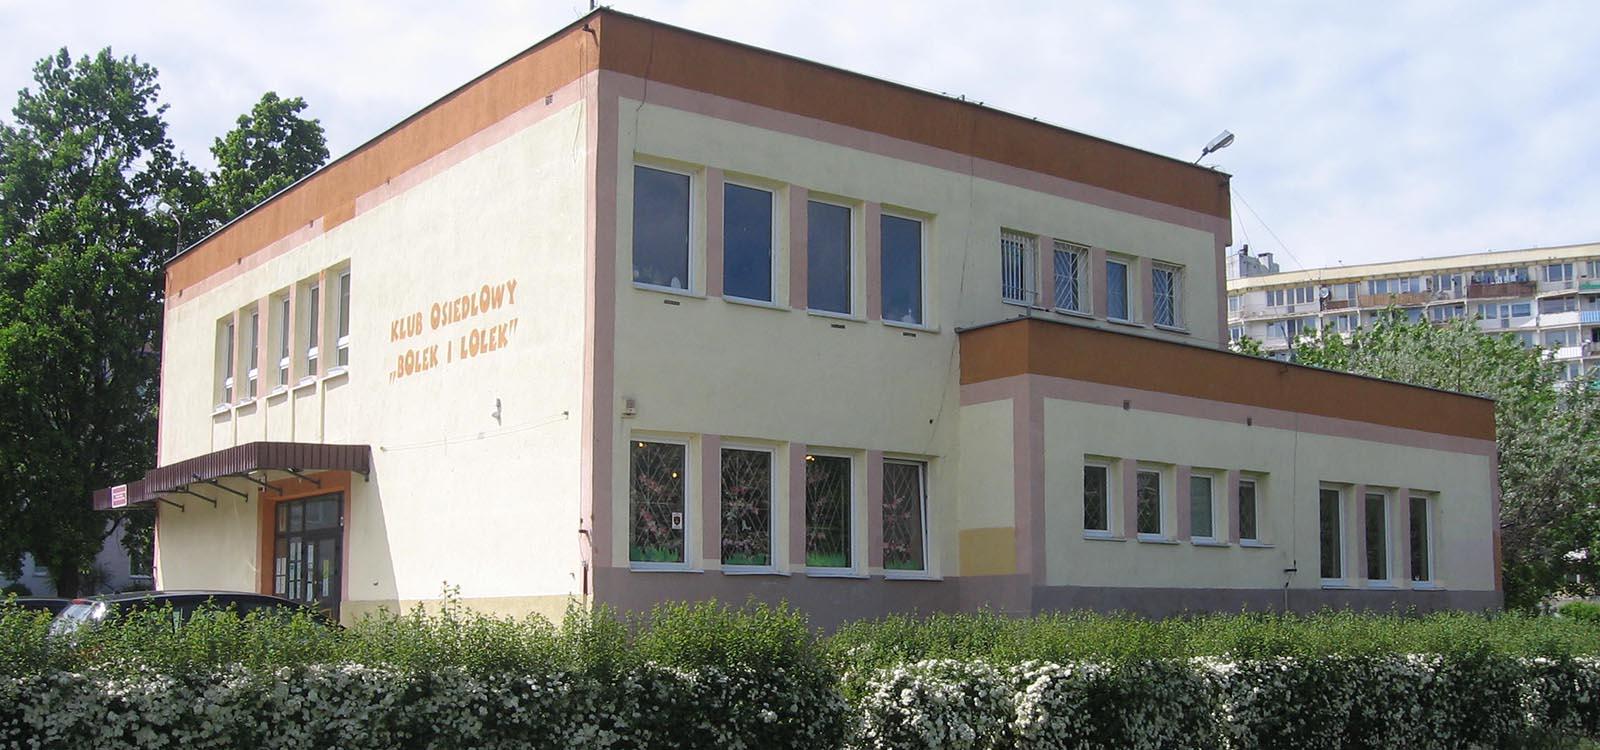 klub osiedlowy Bolek i Lolek